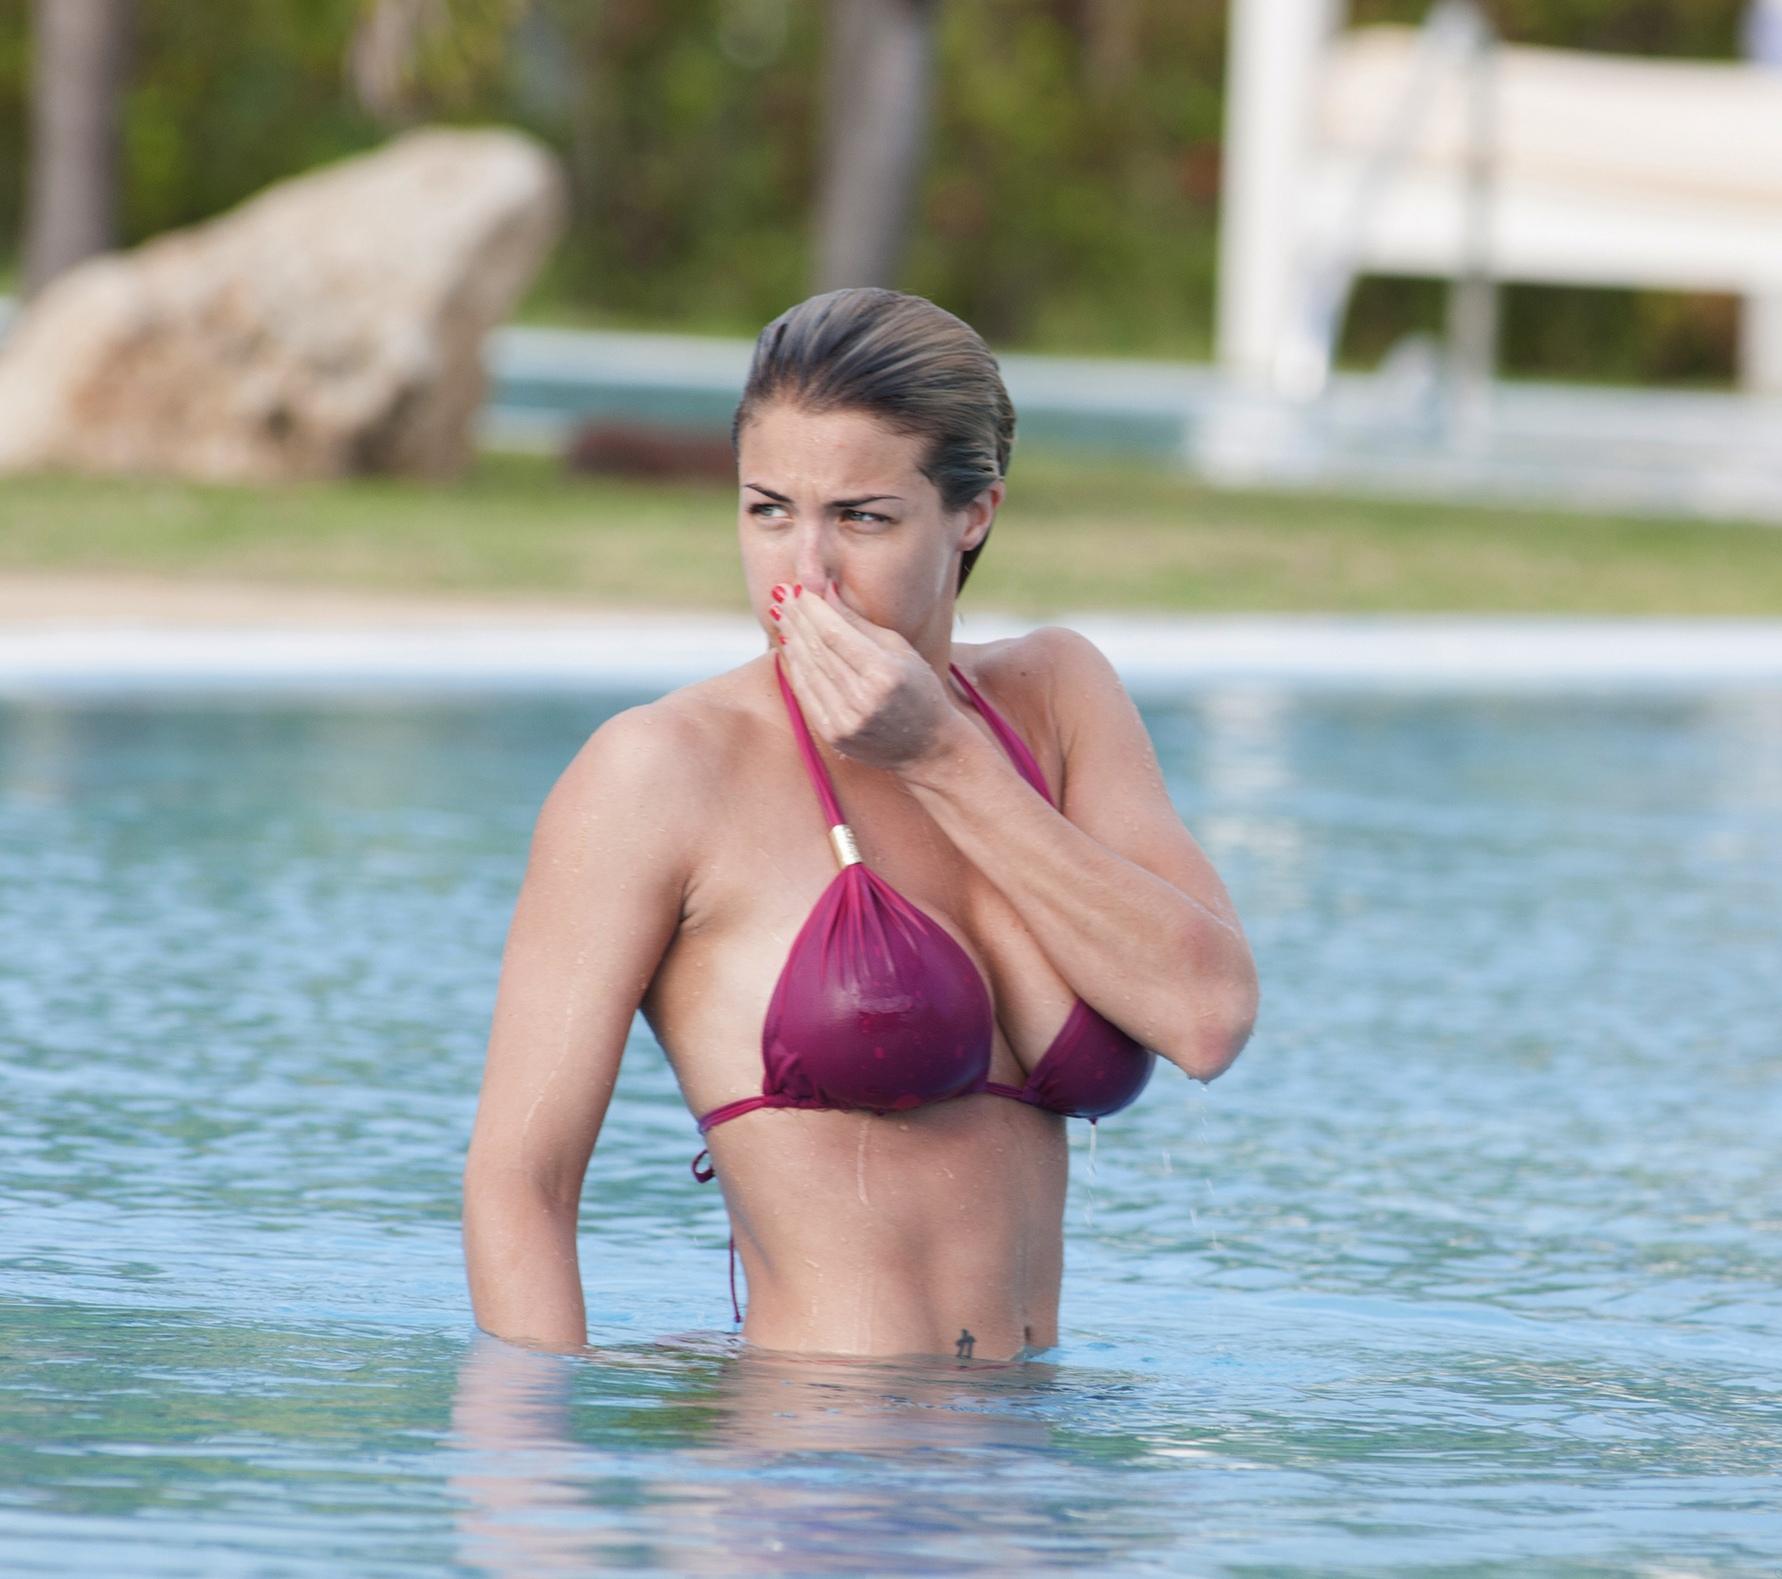 Gemma Atkinson Bikini Pic...